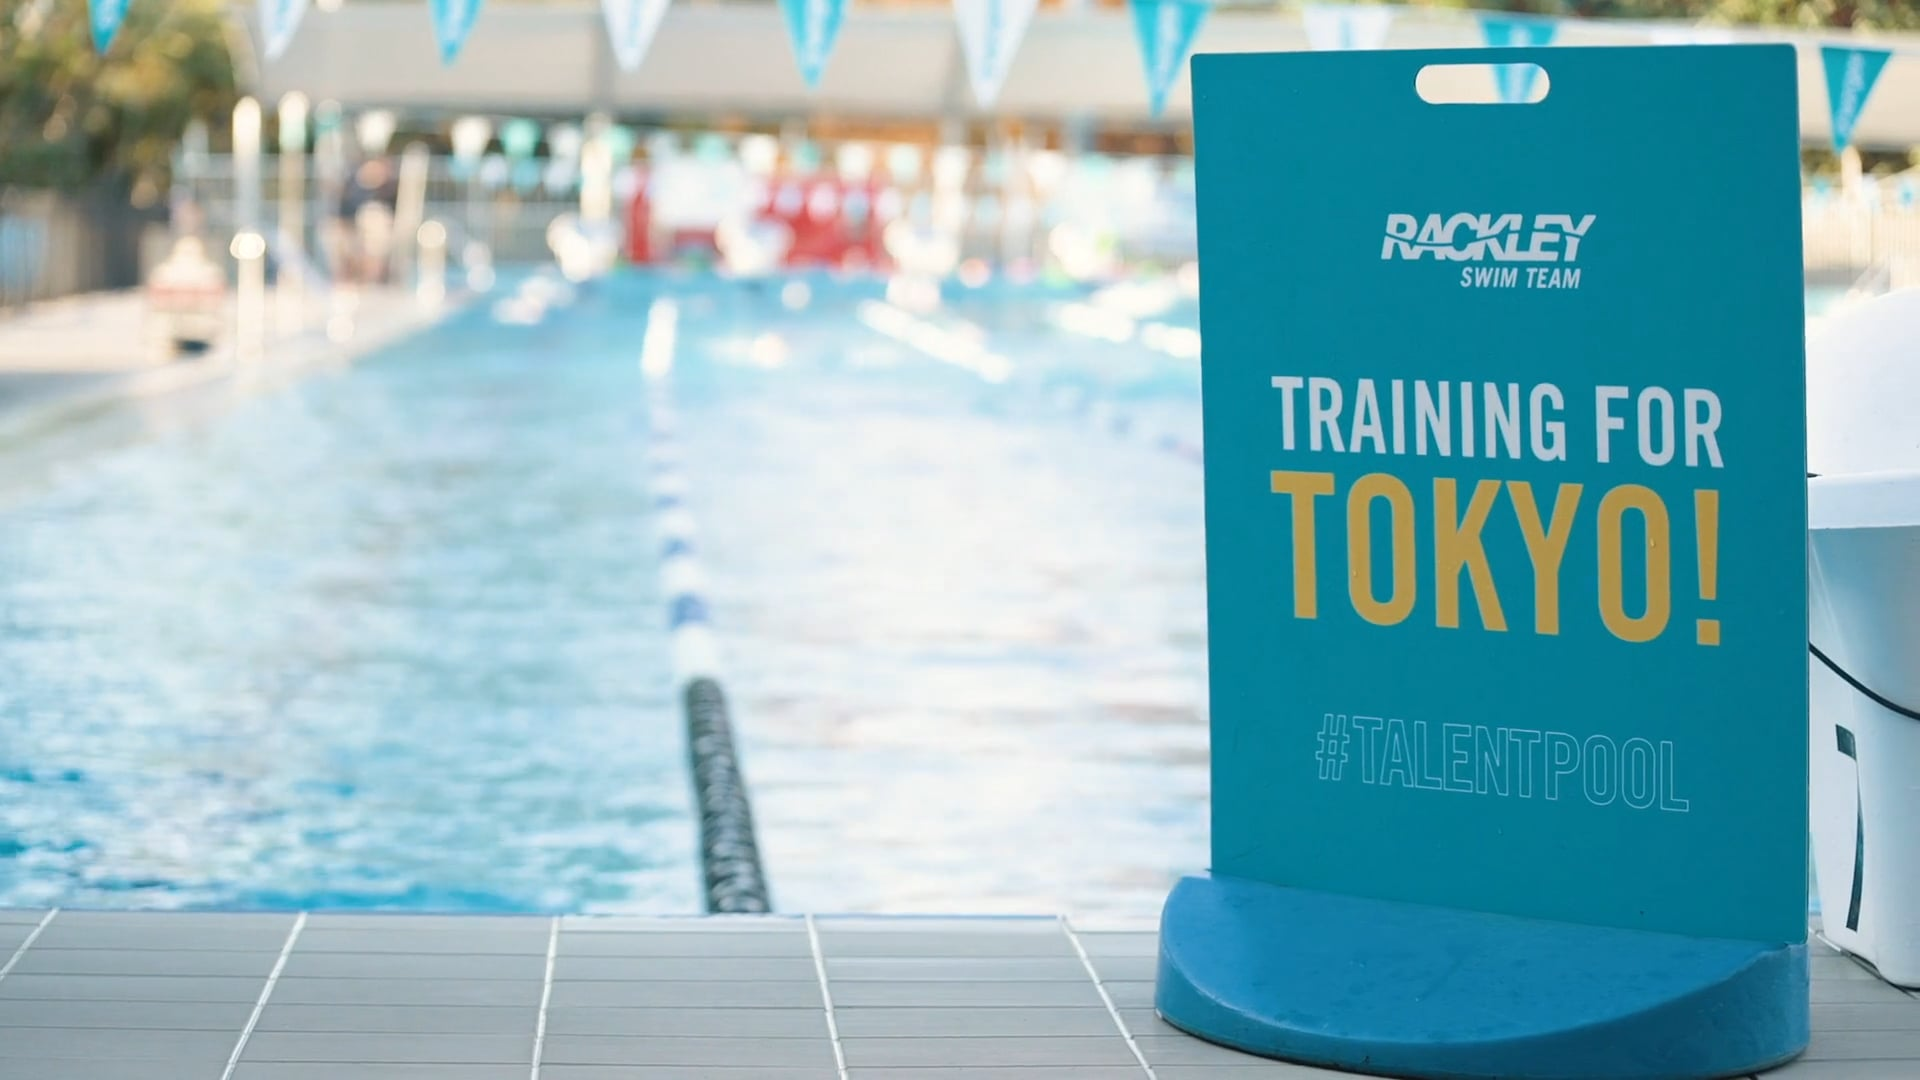 Greatness In The Making - Rackley Swim Team